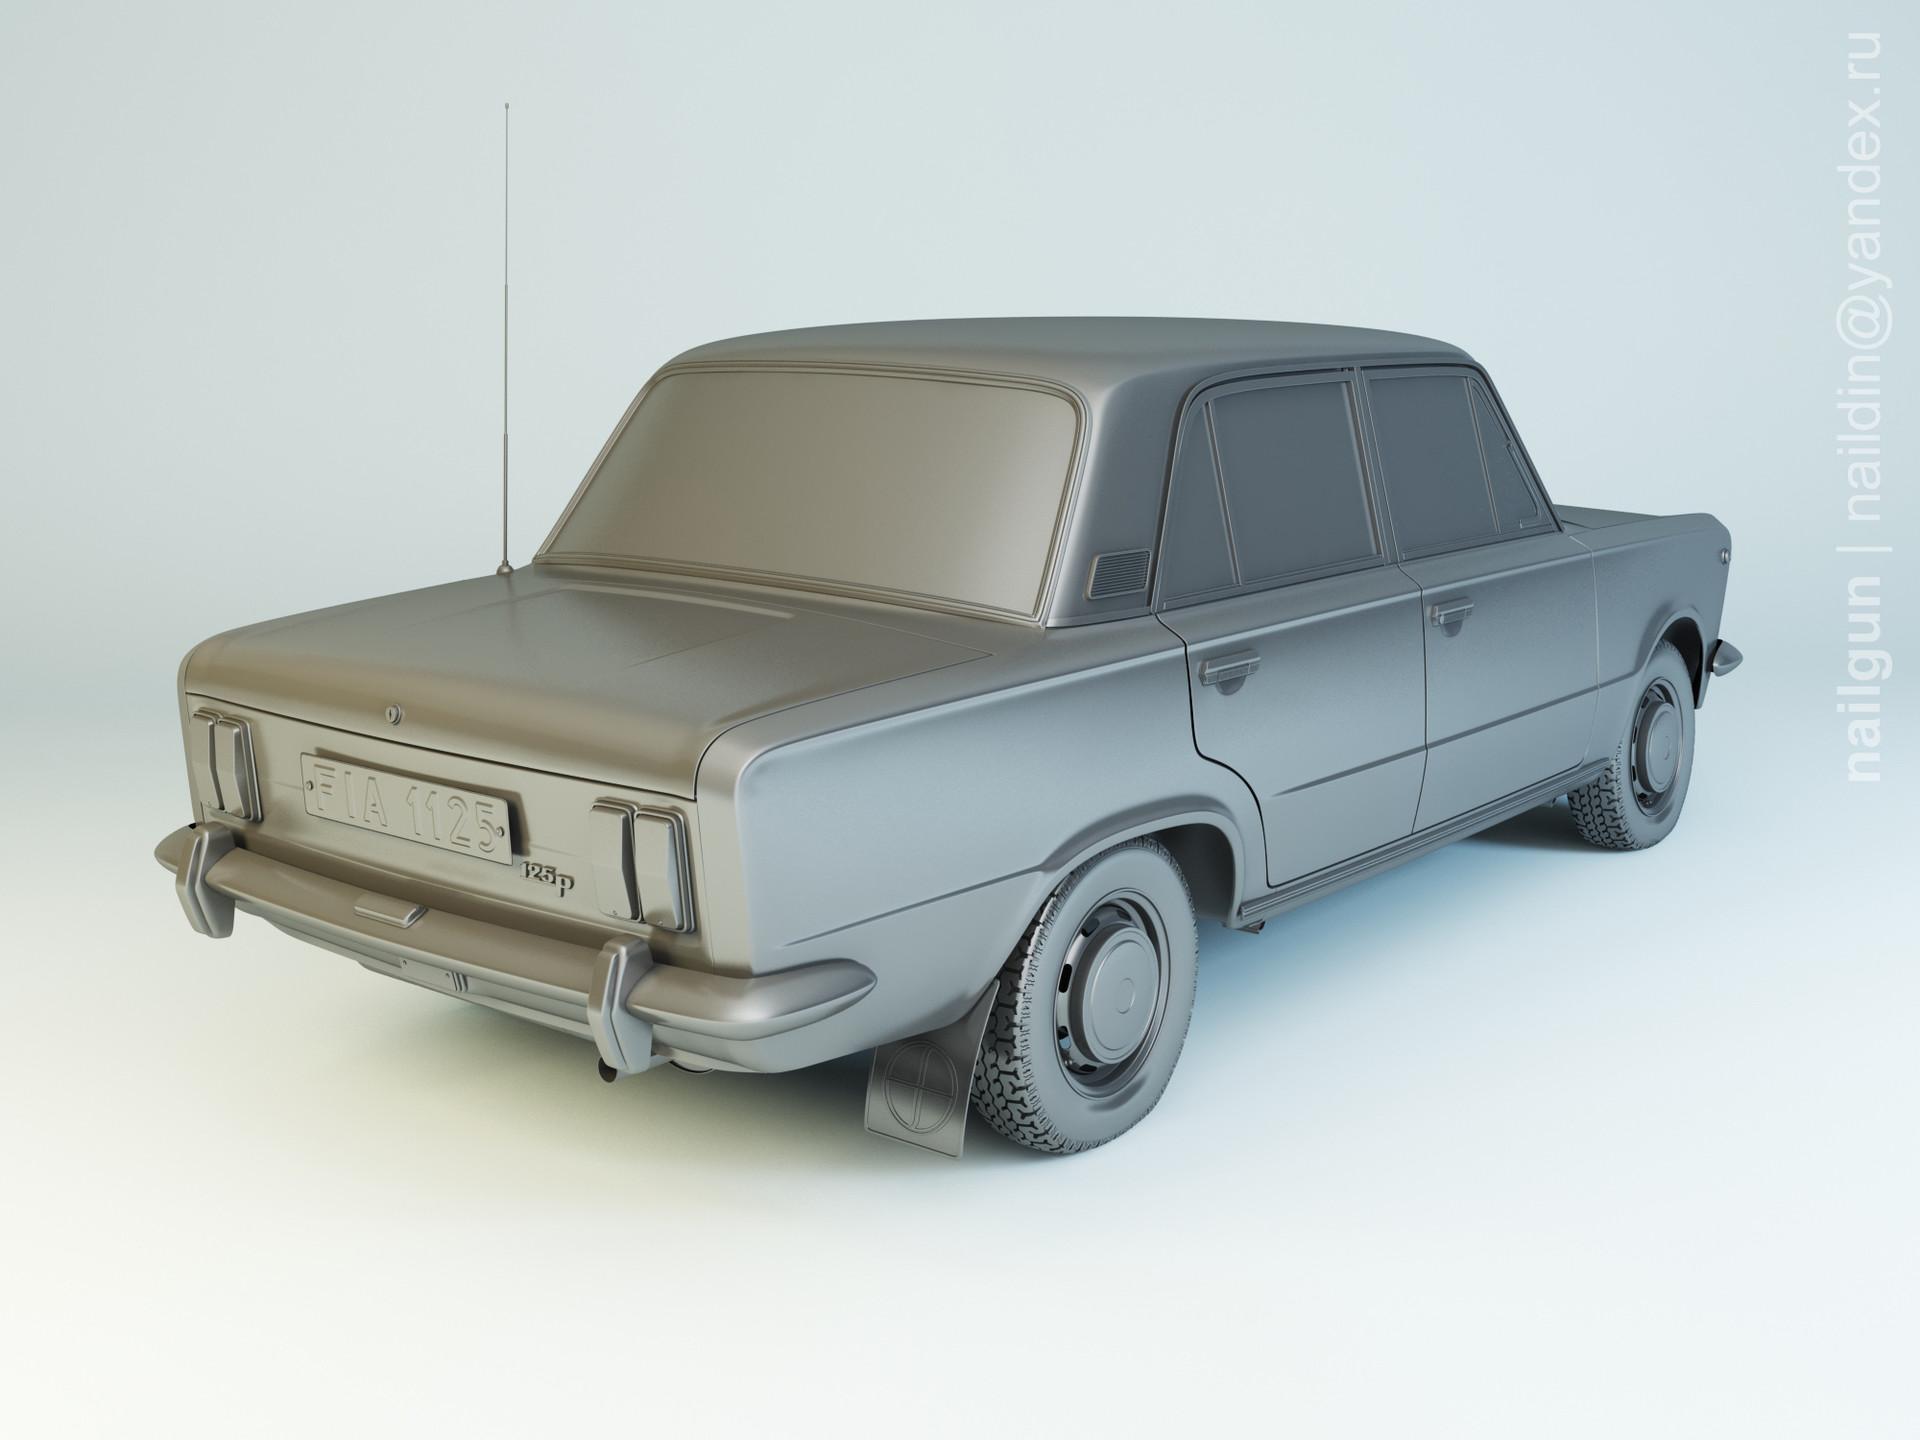 Nail khusnutdinov als 165 001 fiat 125p modelling 1